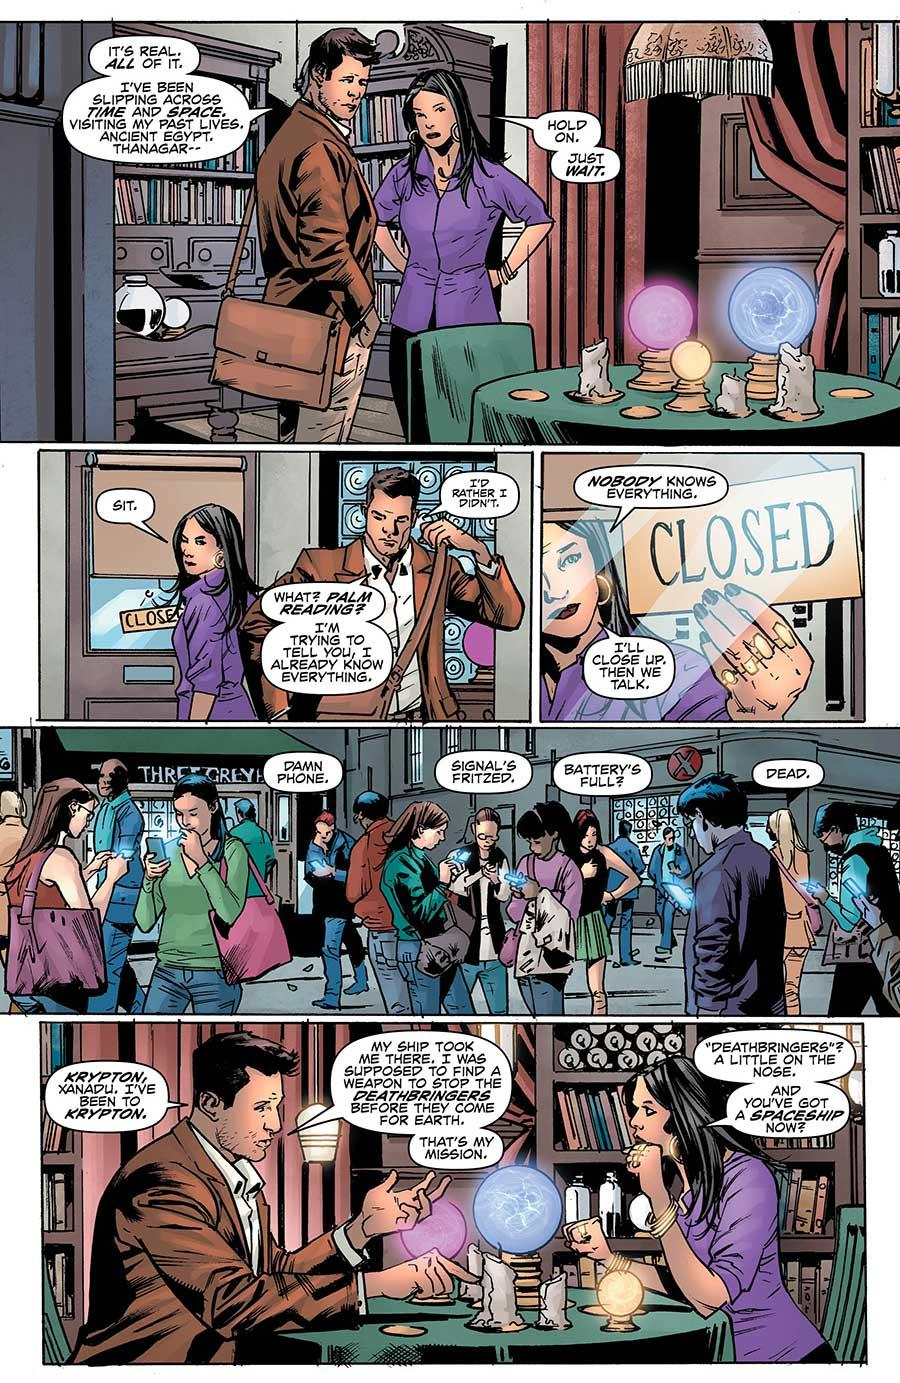 Hawkman 9_3 - DC Comics News